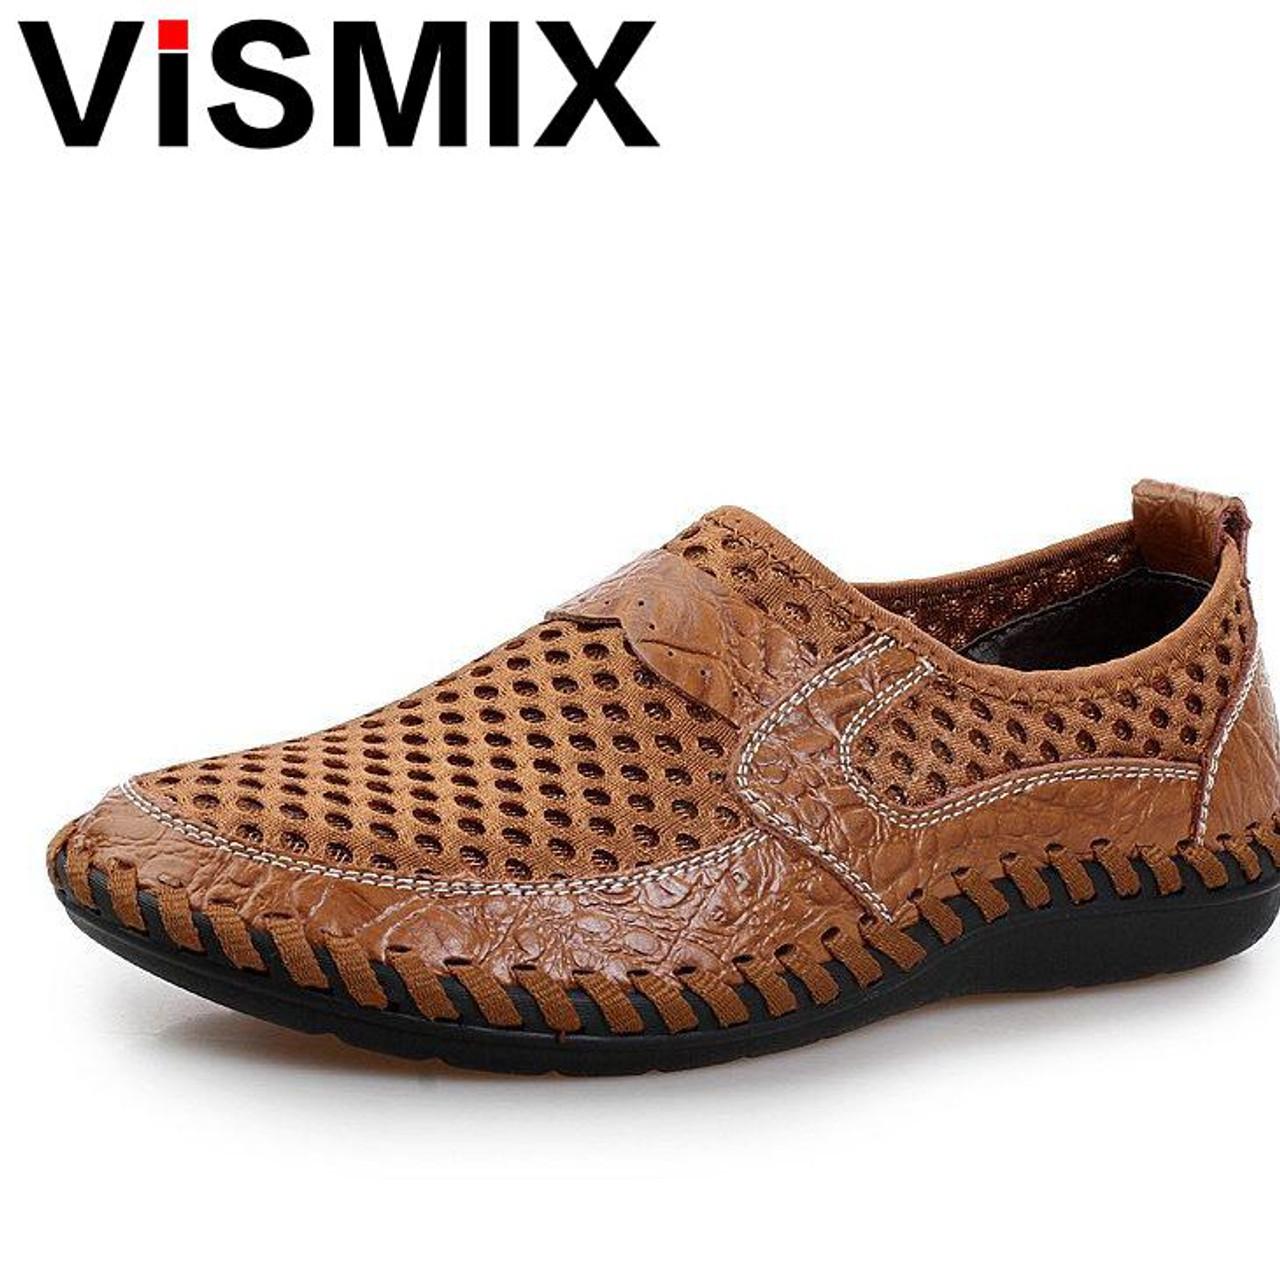 a6855eacca54 VISMIX Men Shoes 2018 Summer Breathable Mesh Shoes Mens Casual Shoes  Genuine Leather Fashion Summer Shoes ...